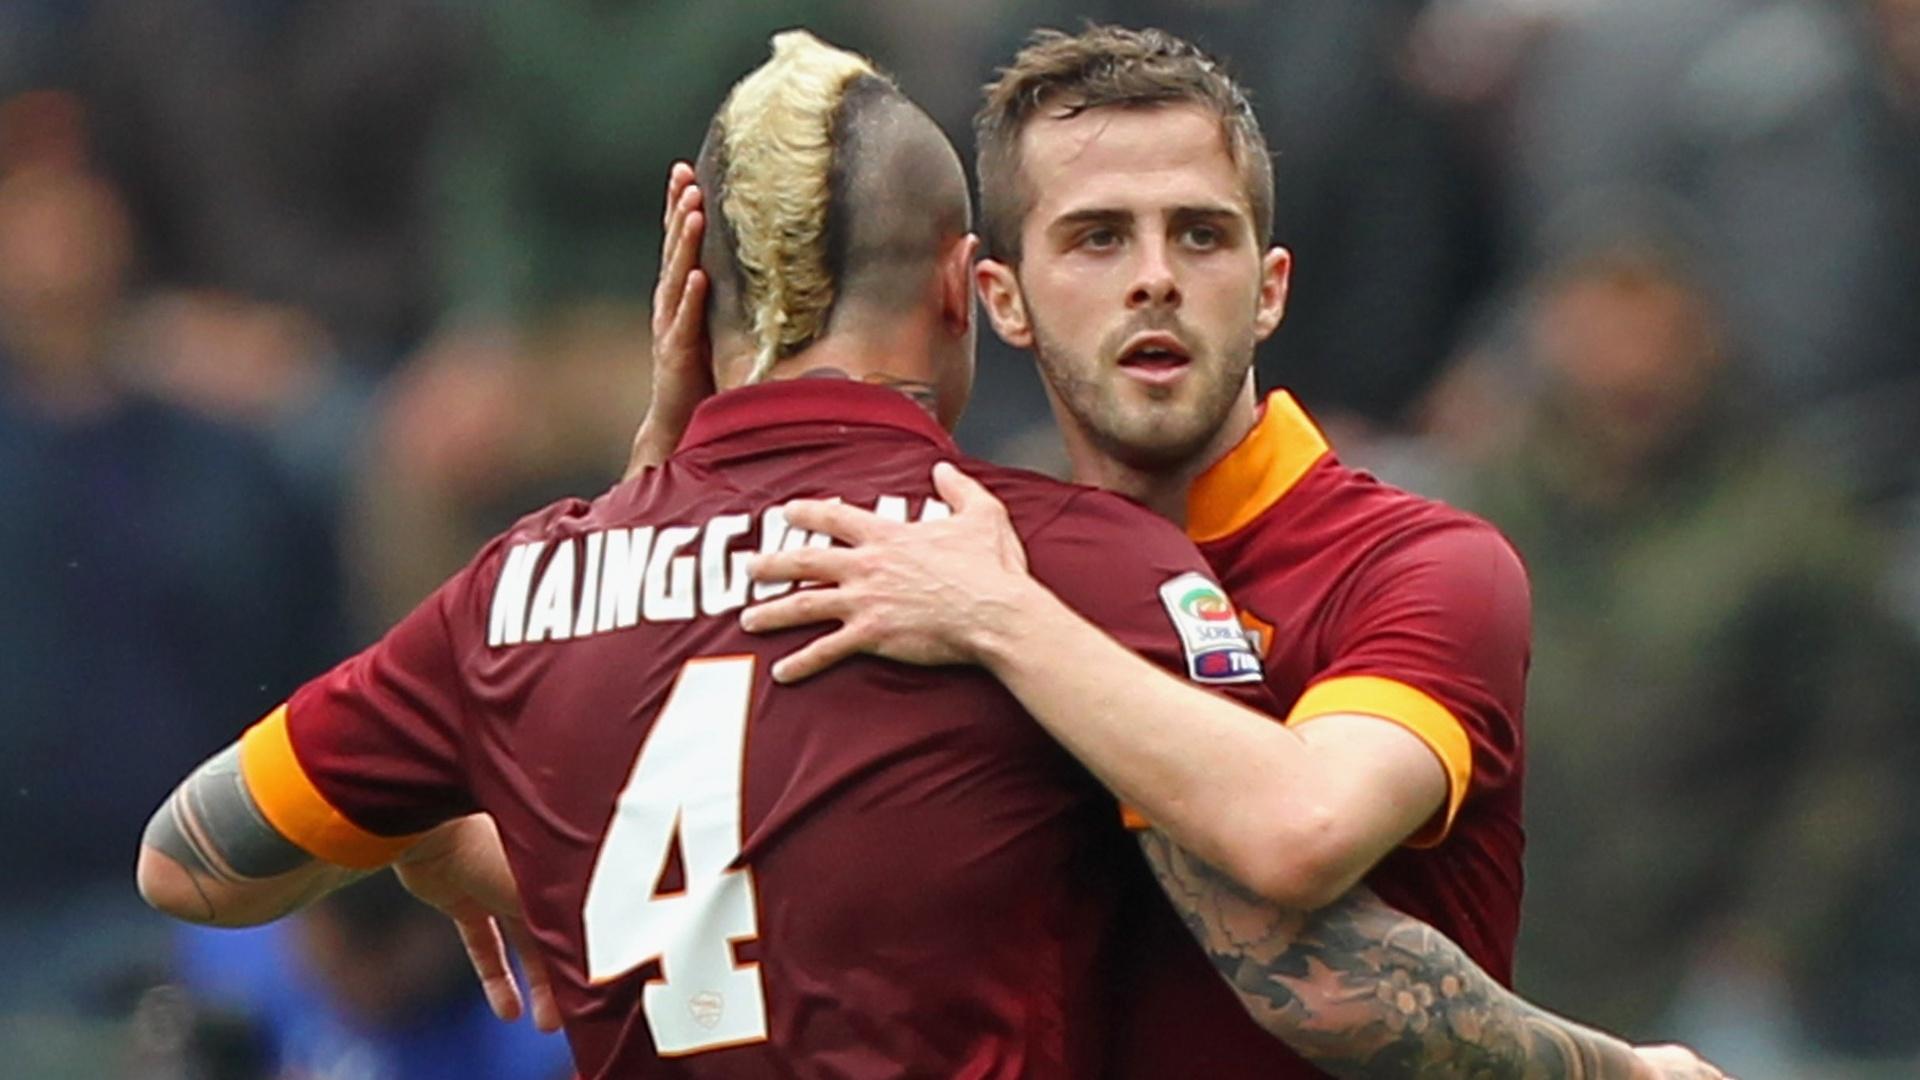 Miralem Pjanic e Radja Nainggolan se abraçam durante partida da Roma